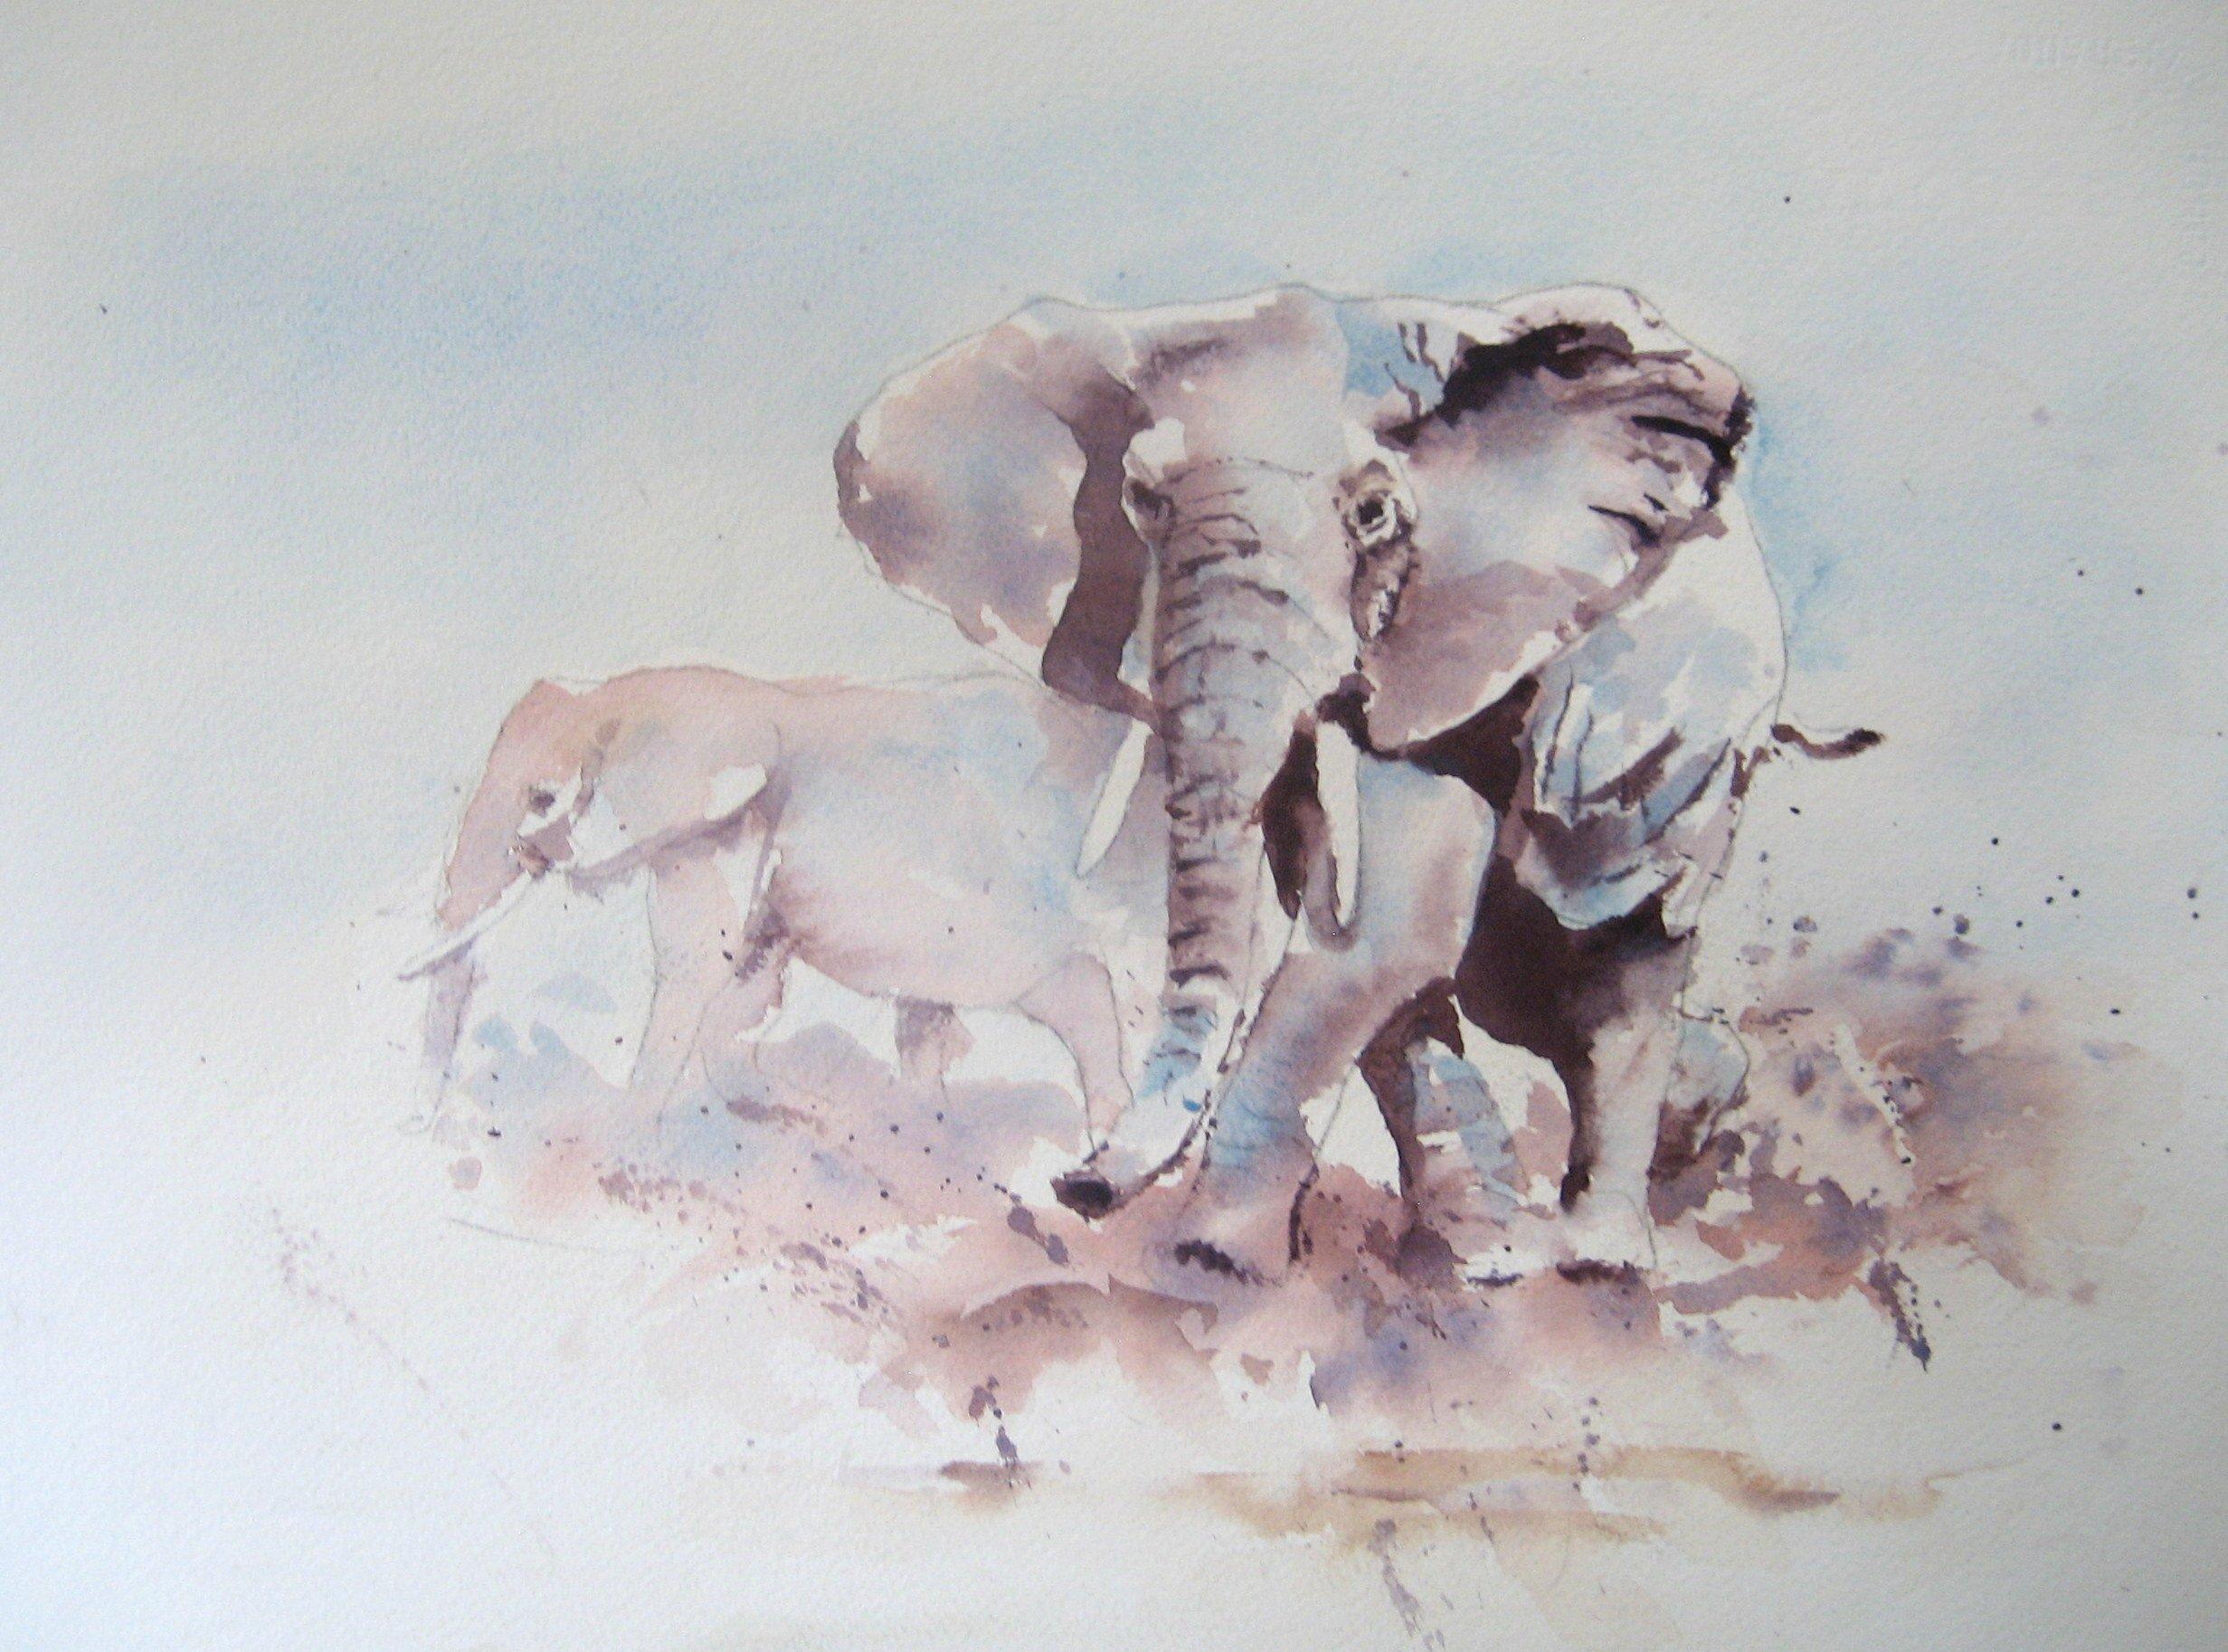 https://0201.nccdn.net/1_2/000/000/176/032/elephant.jpg